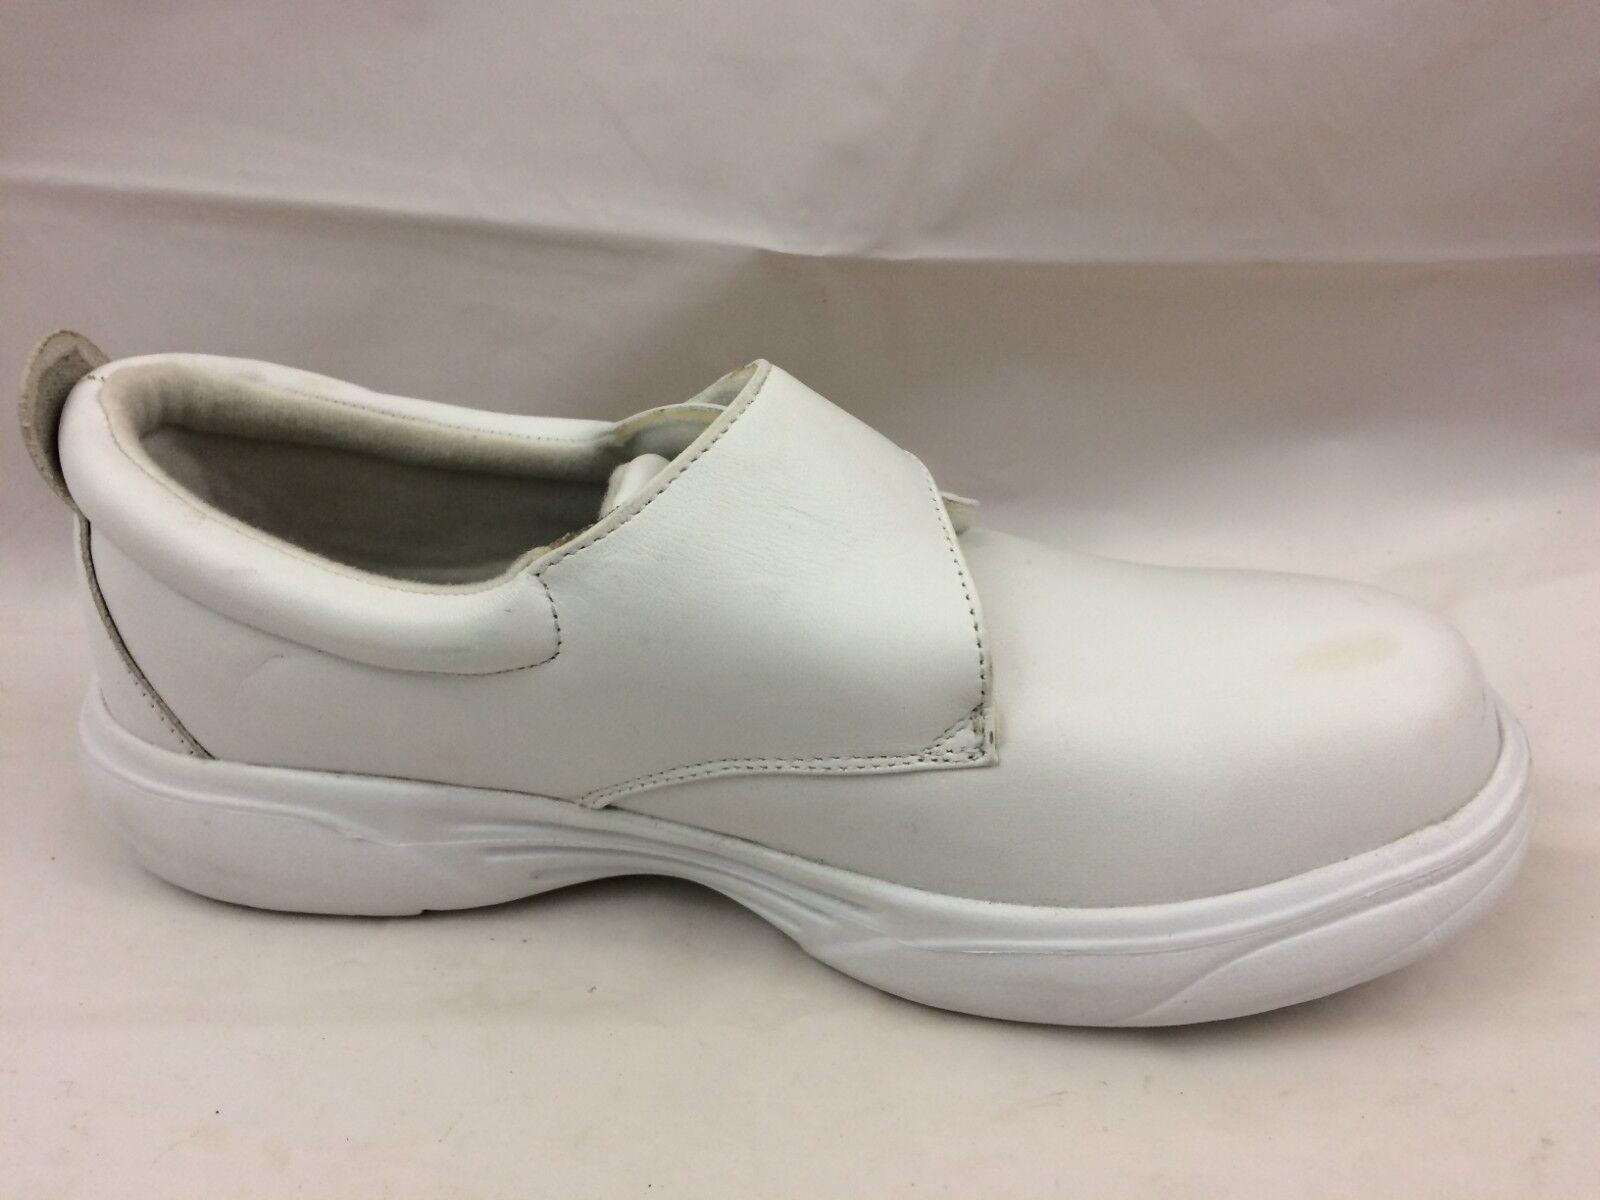 MT EMEY 9209 5E damen 8 5E 9209 Extra Wide Weiß Leather Therapeutic Lightweight schuhe 999e7c